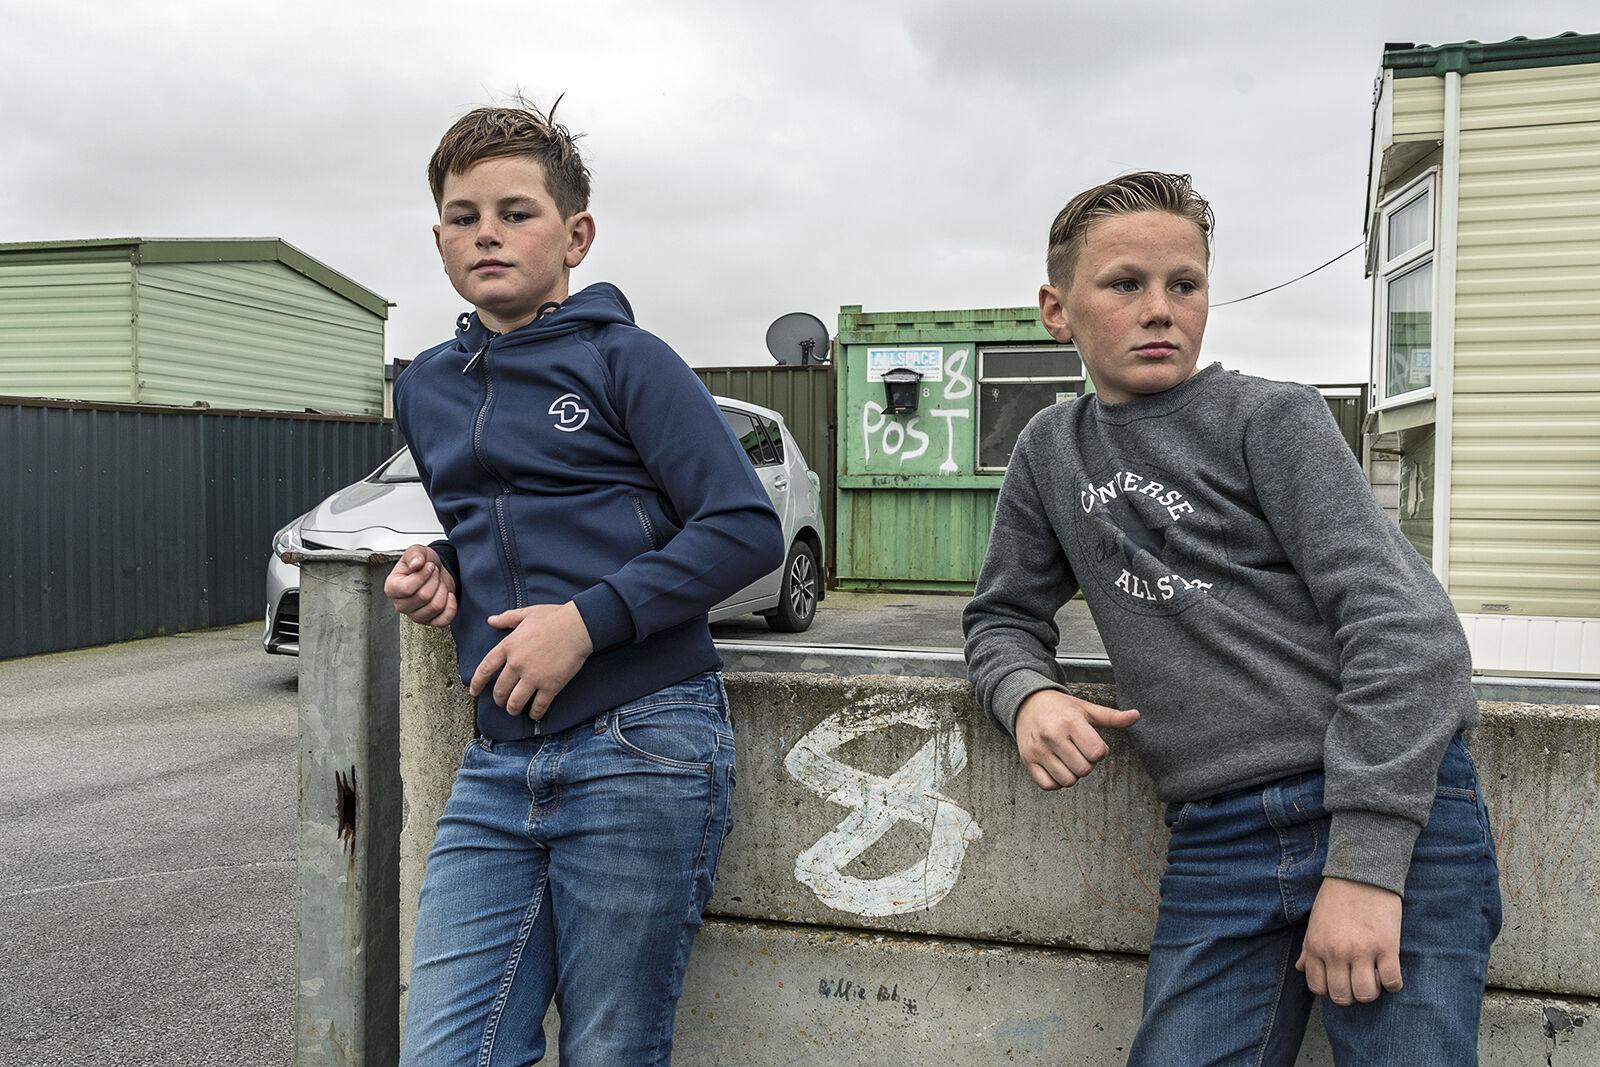 Delaney Brothers, Galway, Ireland 2019